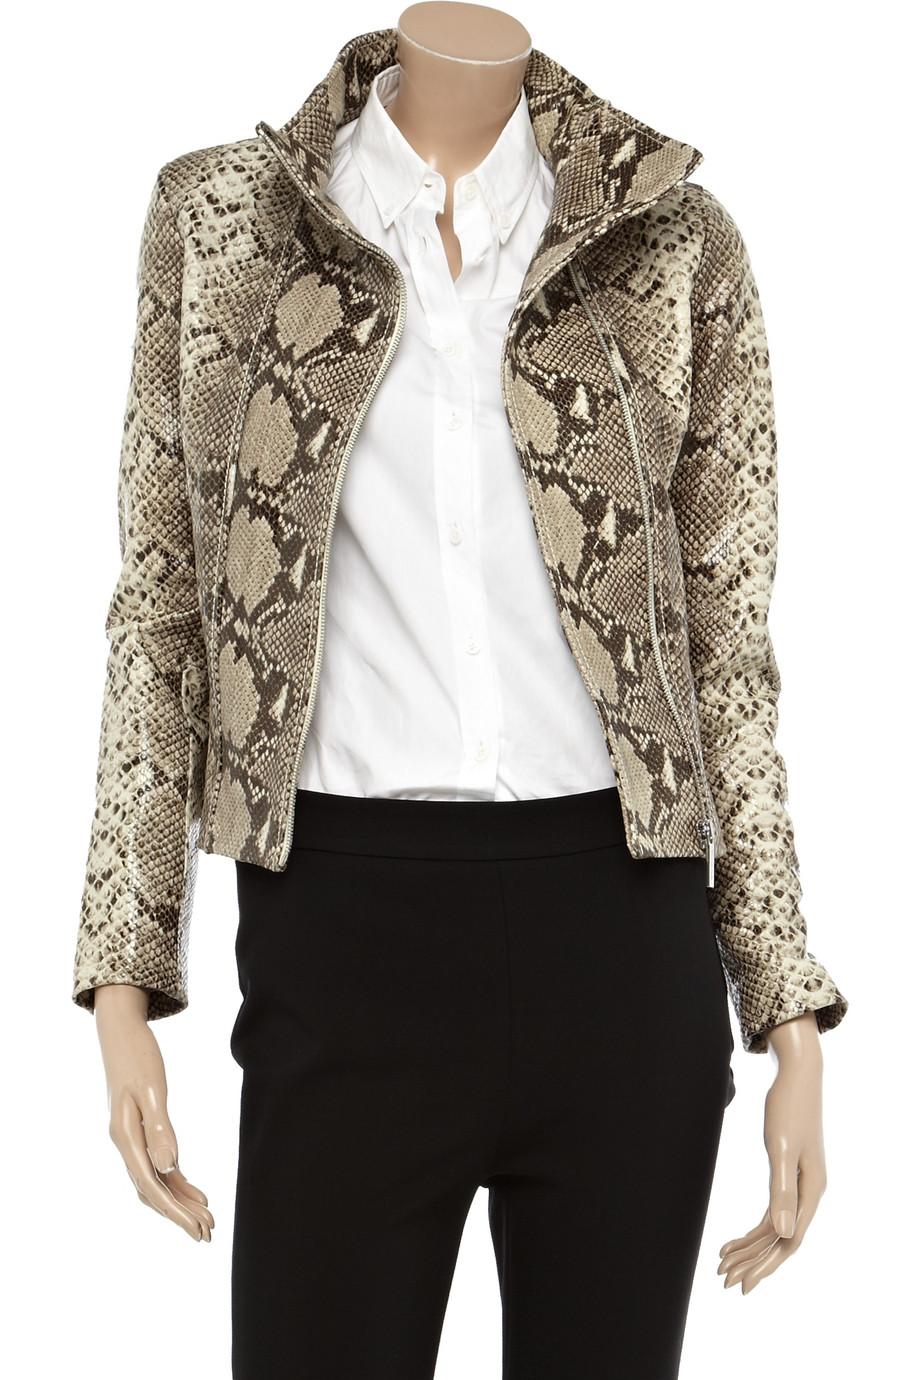 Michael kors gray leather jacket